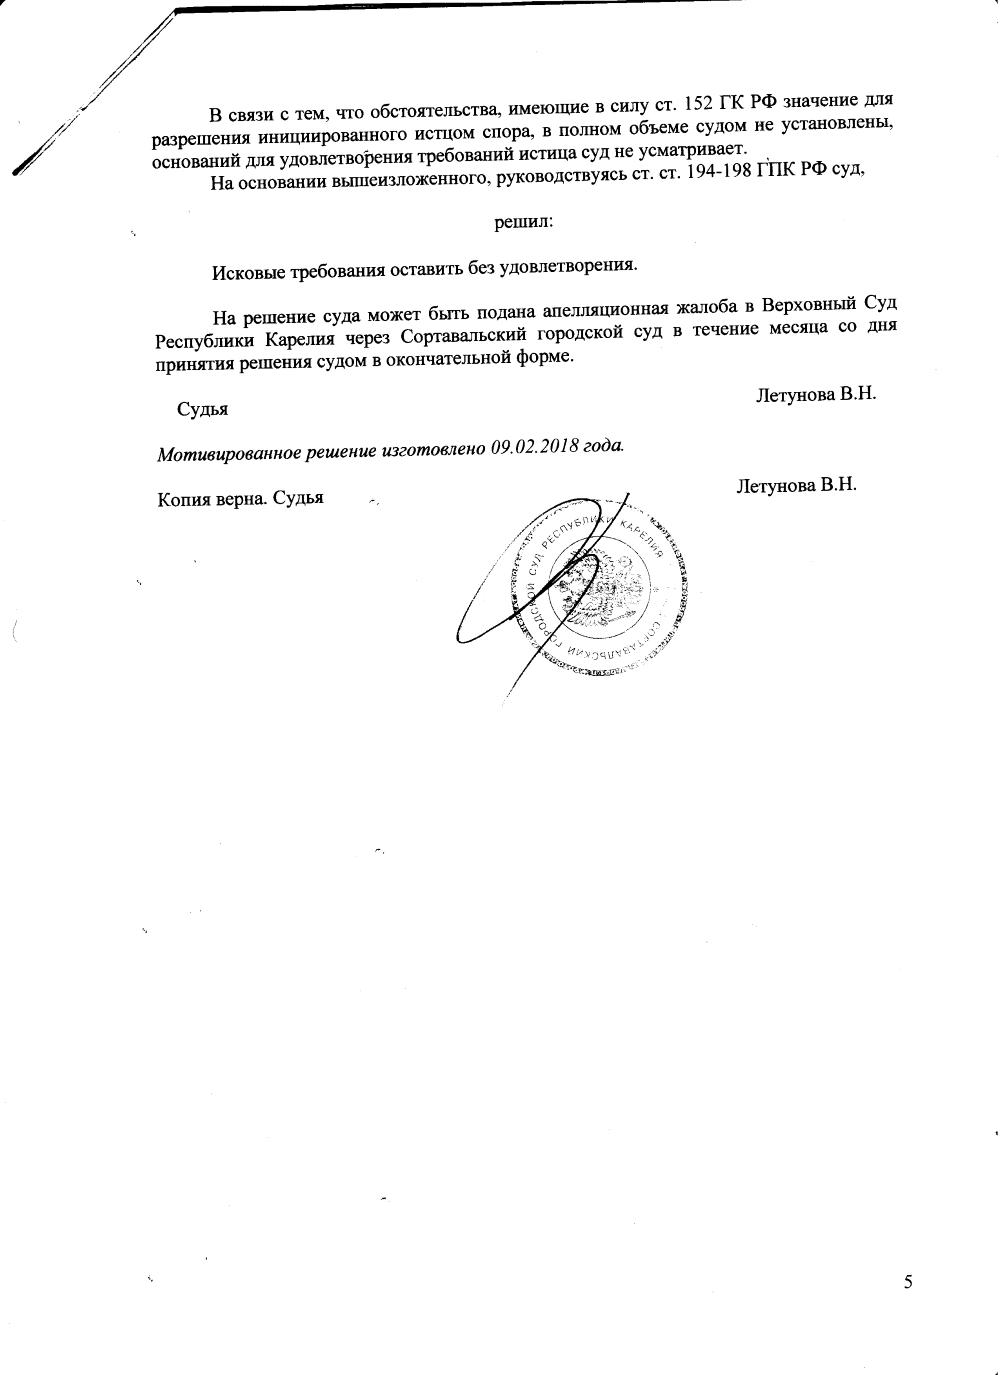 https://sontgranit.ru/forum/img/sokol/20180209-решение-6.png